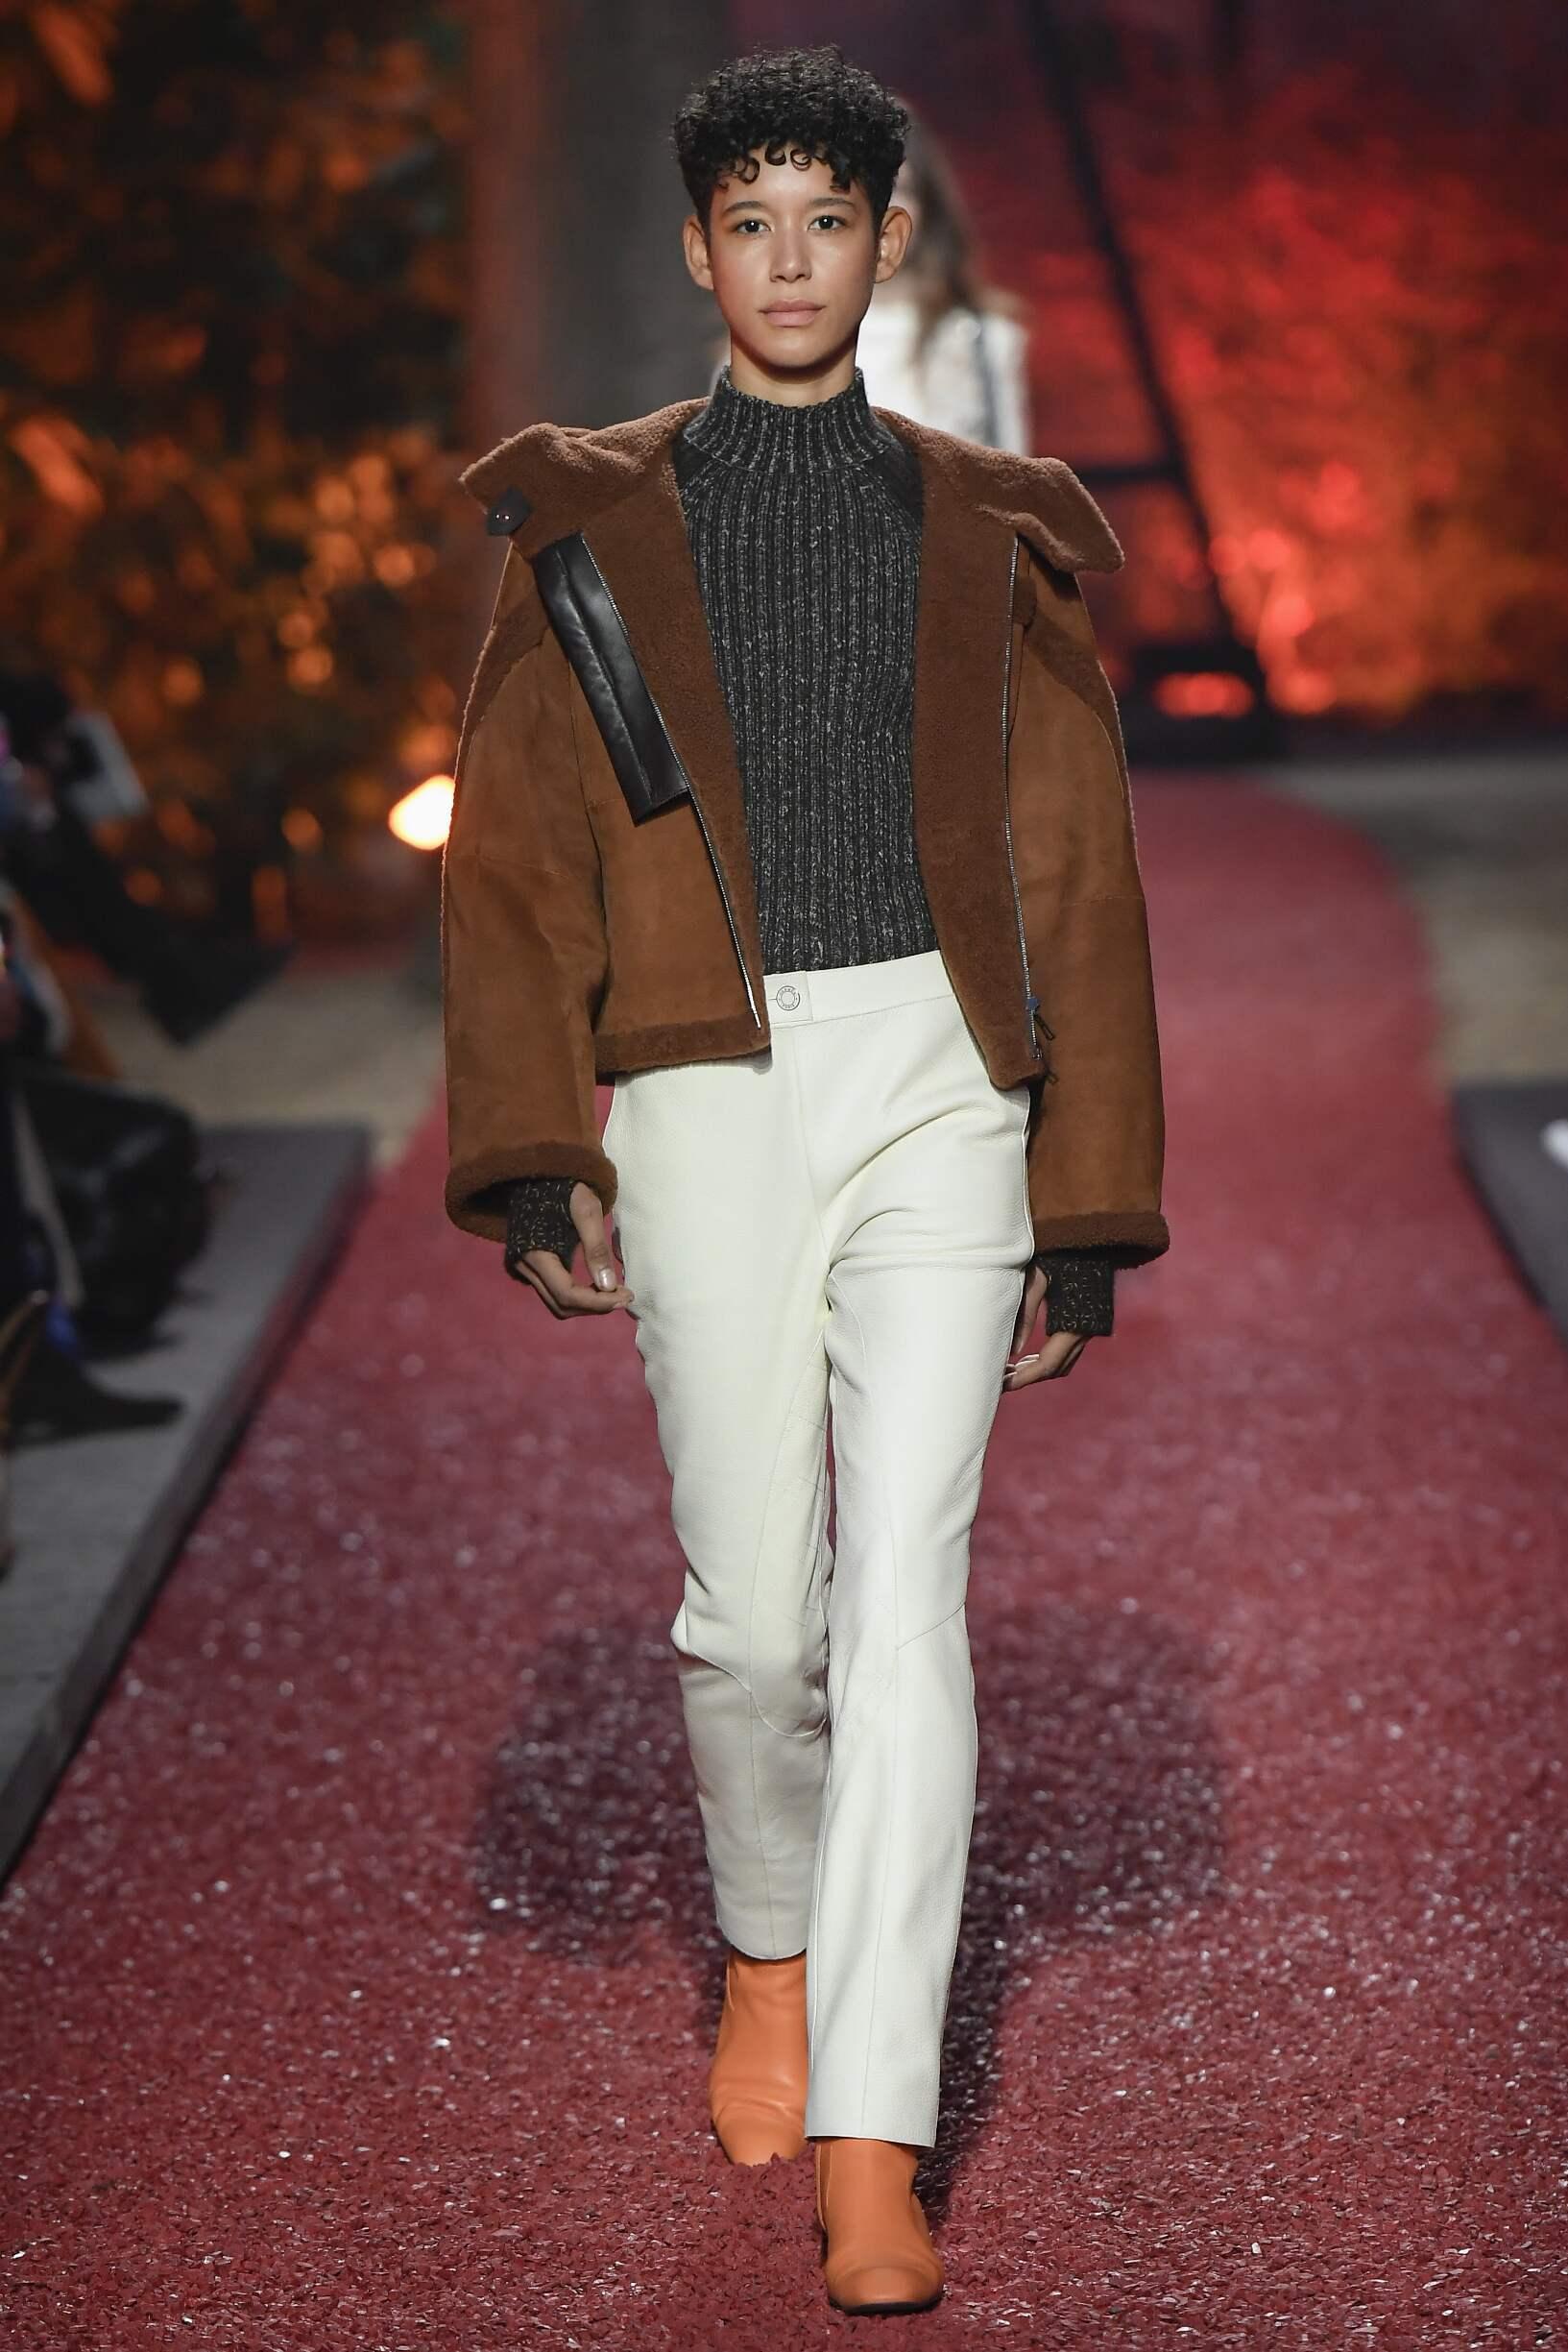 2018 Hermès Woman Winter Runway